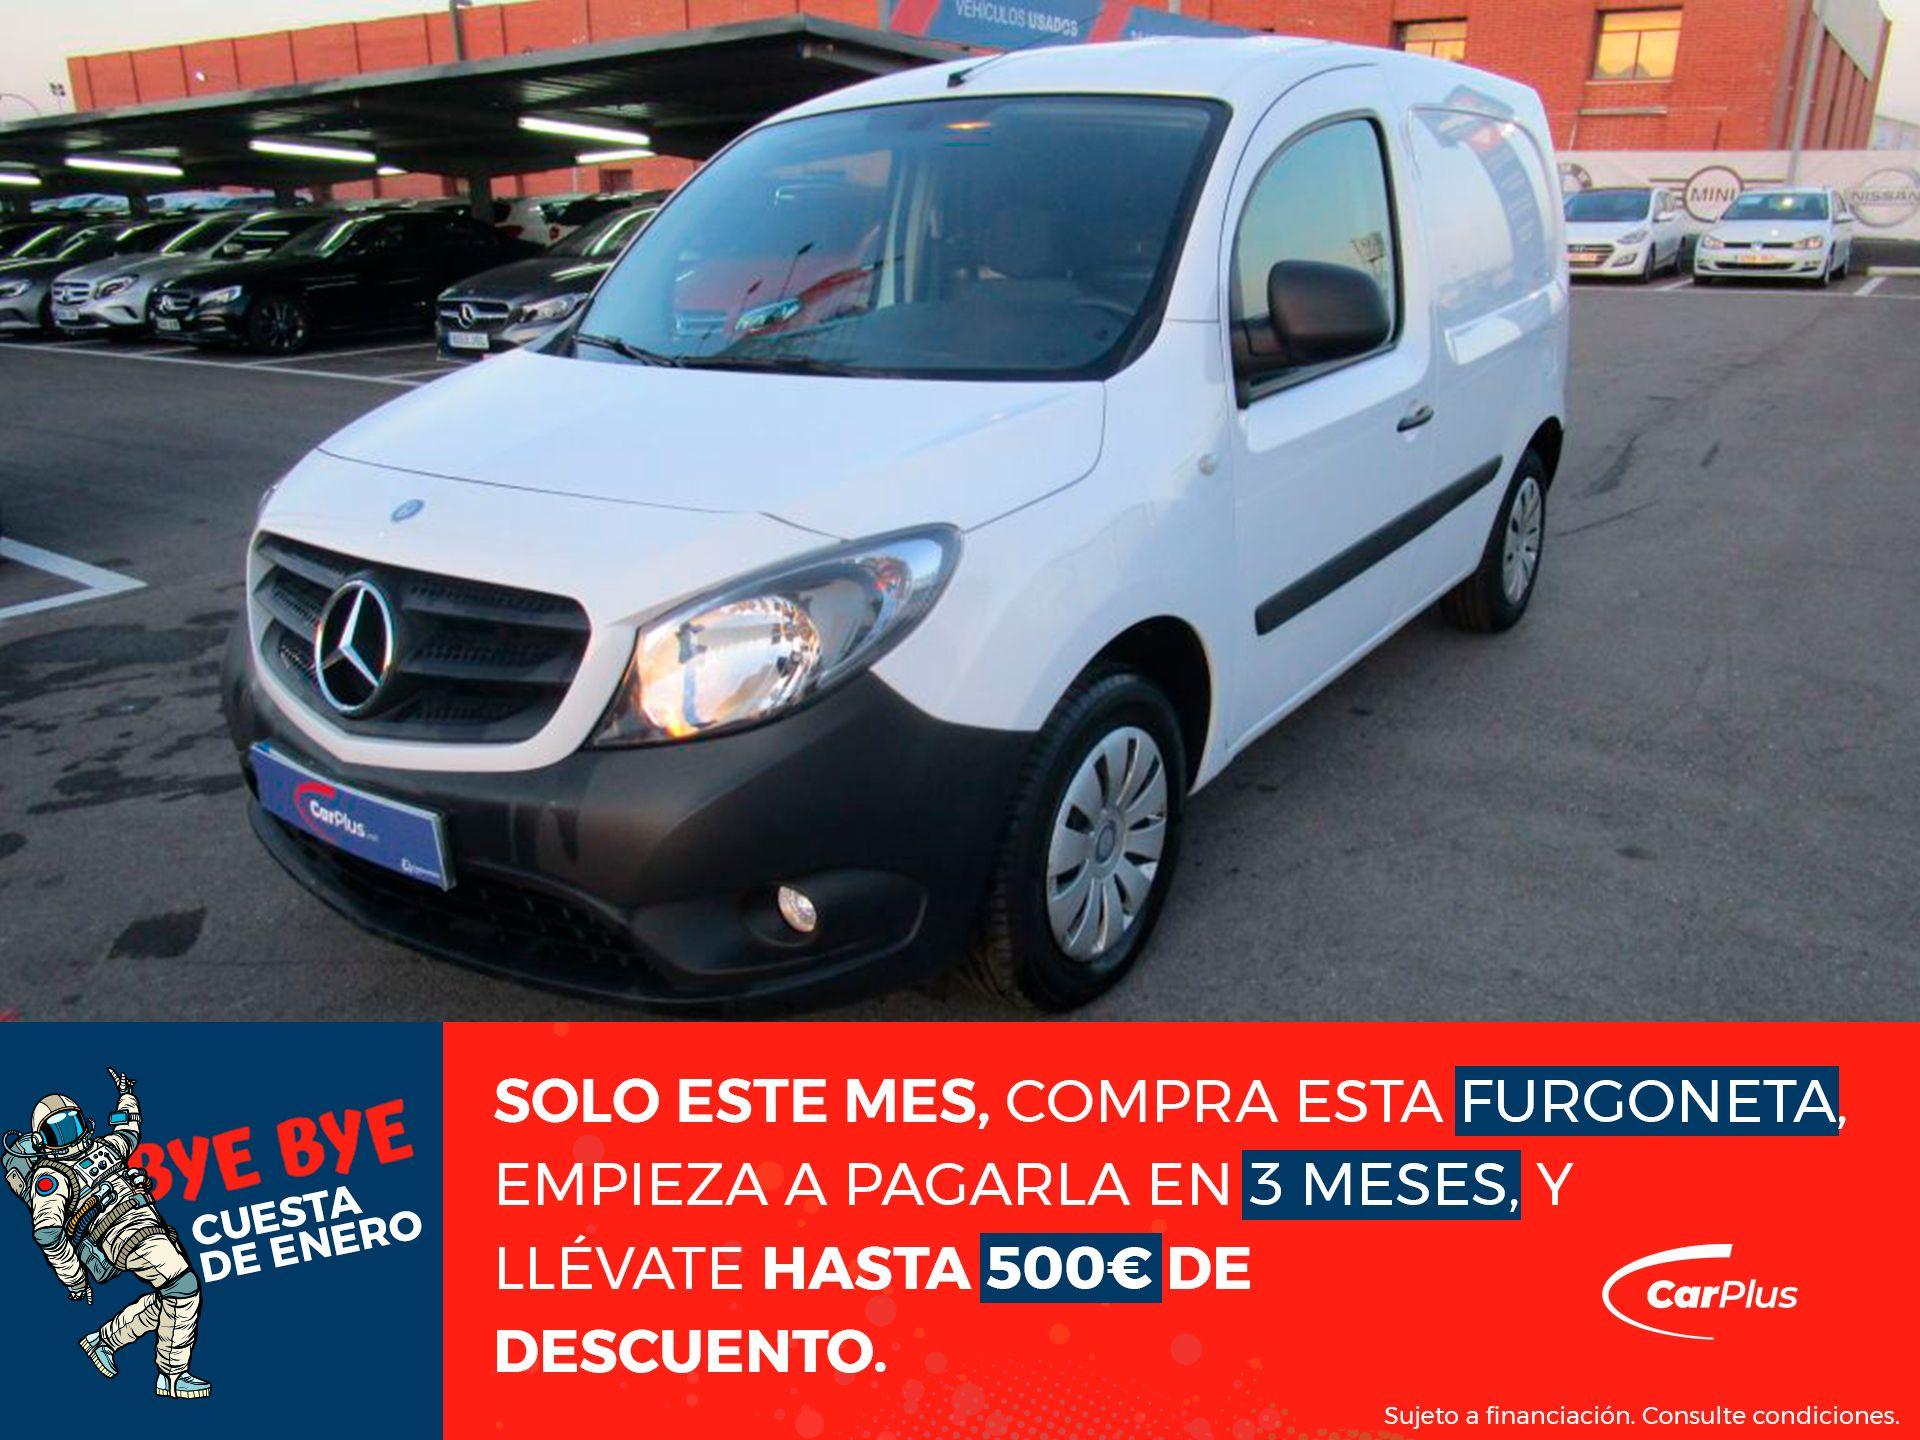 Mercedes Benz Citan 109 CDI Furgón Largo segunda mano Madrid